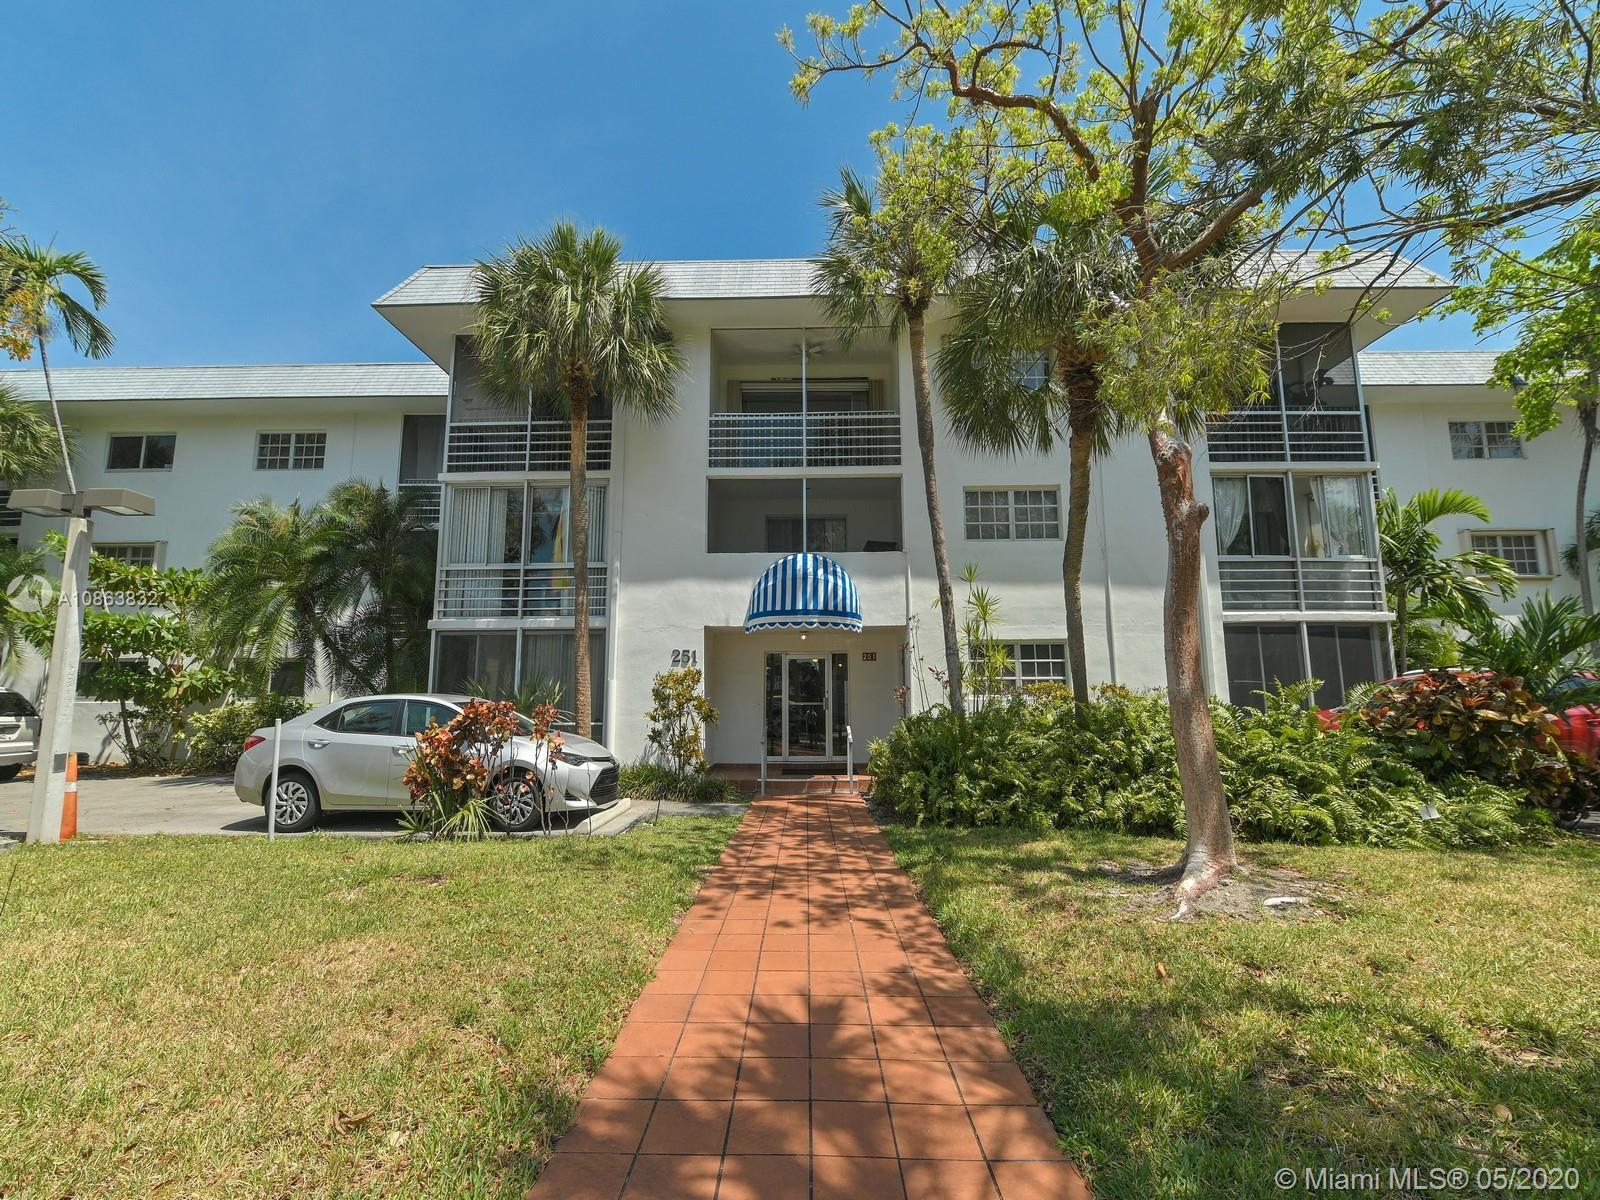 251 Galen Dr # 215, Key Biscayne, Florida 33149, 1 Bedroom Bedrooms, ,2 BathroomsBathrooms,Residential,For Sale,251 Galen Dr # 215,A10863832